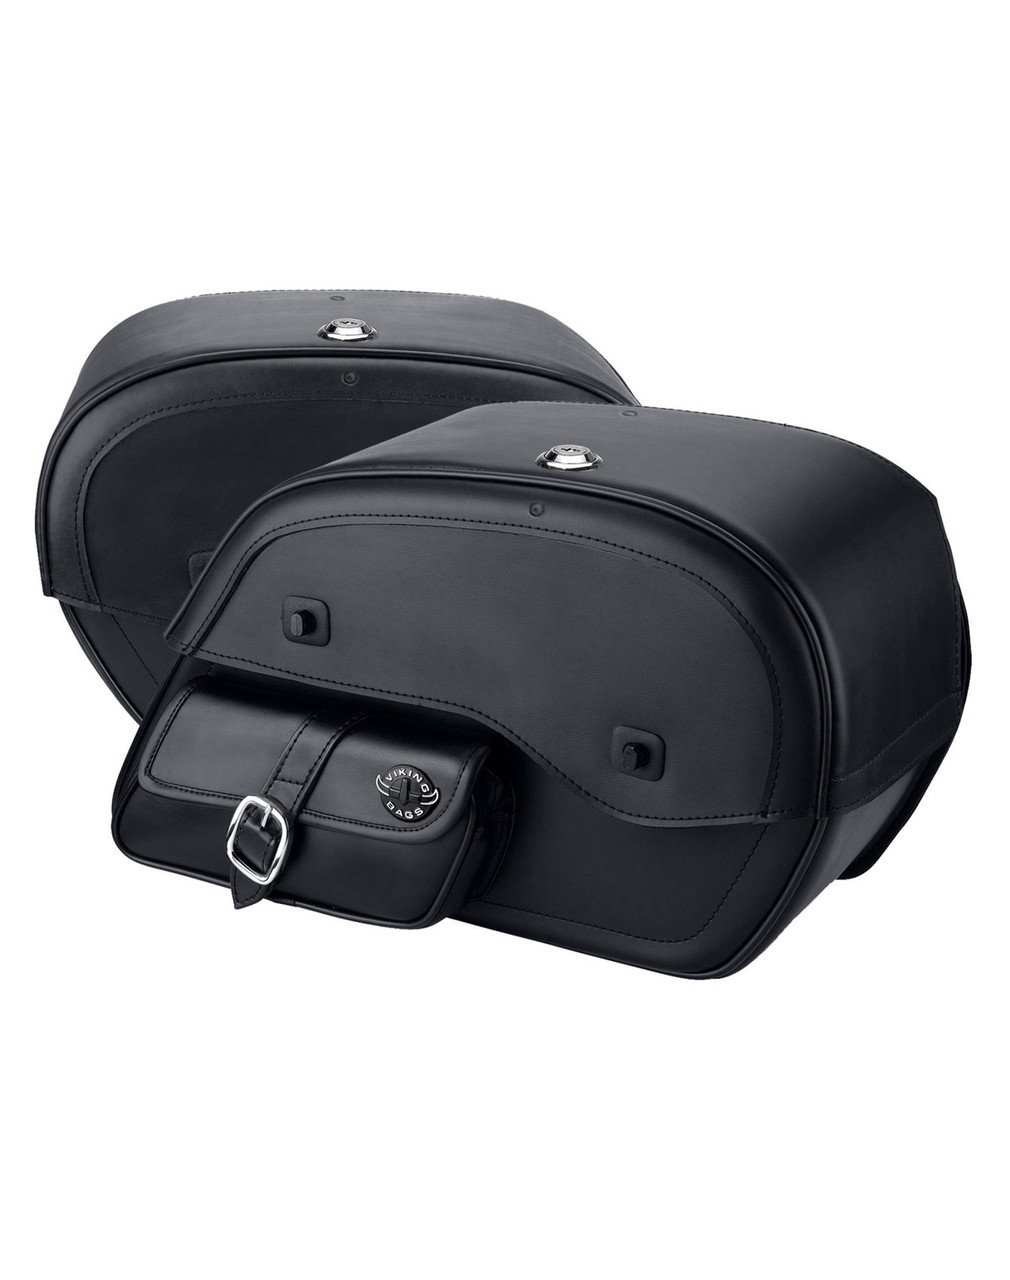 Kawasaki Vulcan 750 Side Pocket Plain Large Motorcycle Saddlebags Both Bags View